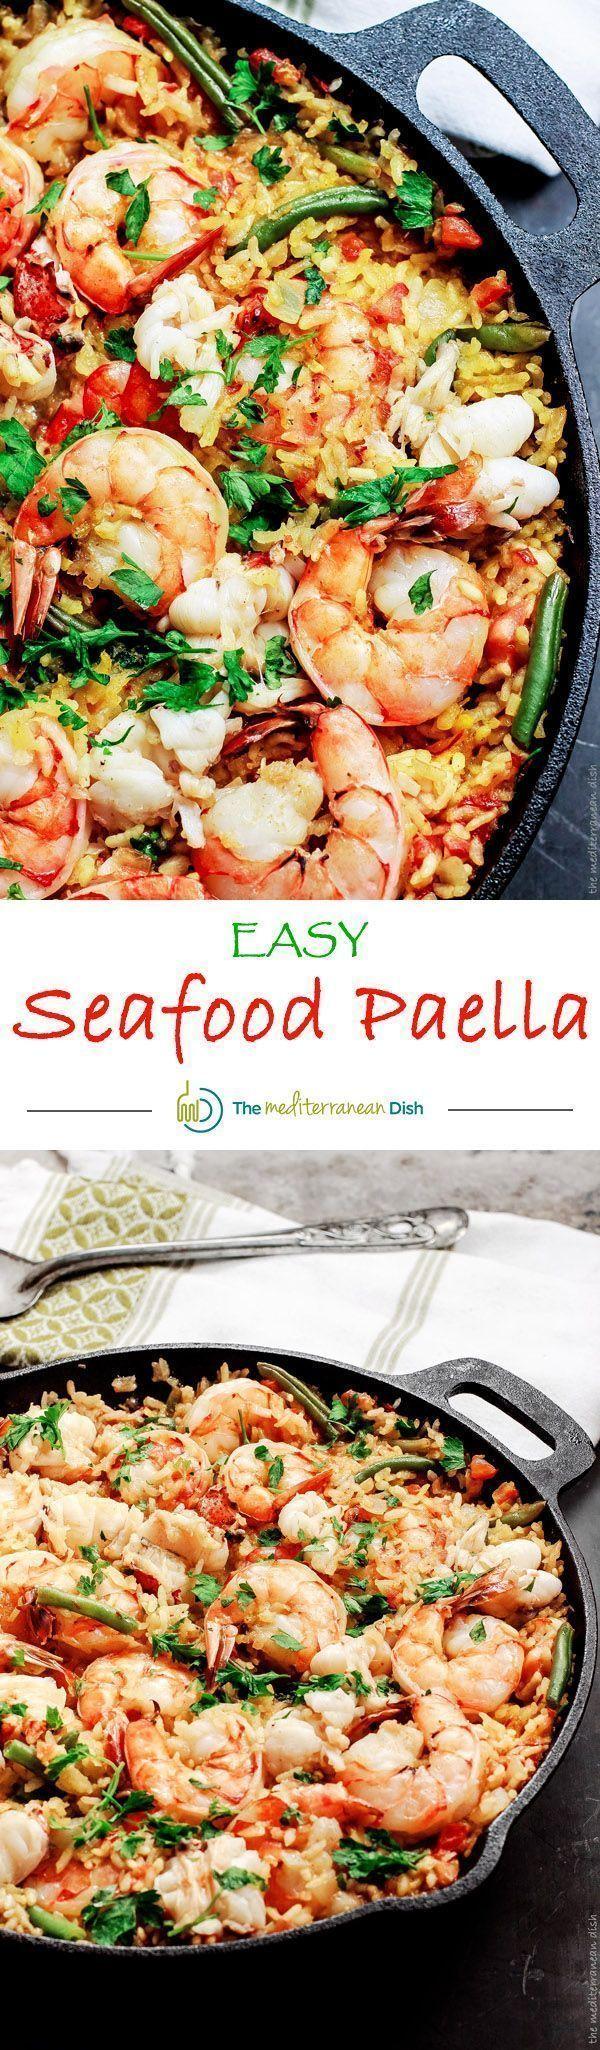 ... Paella Recipe on Pinterest | Paella, Vegetarian Paella and Seafood